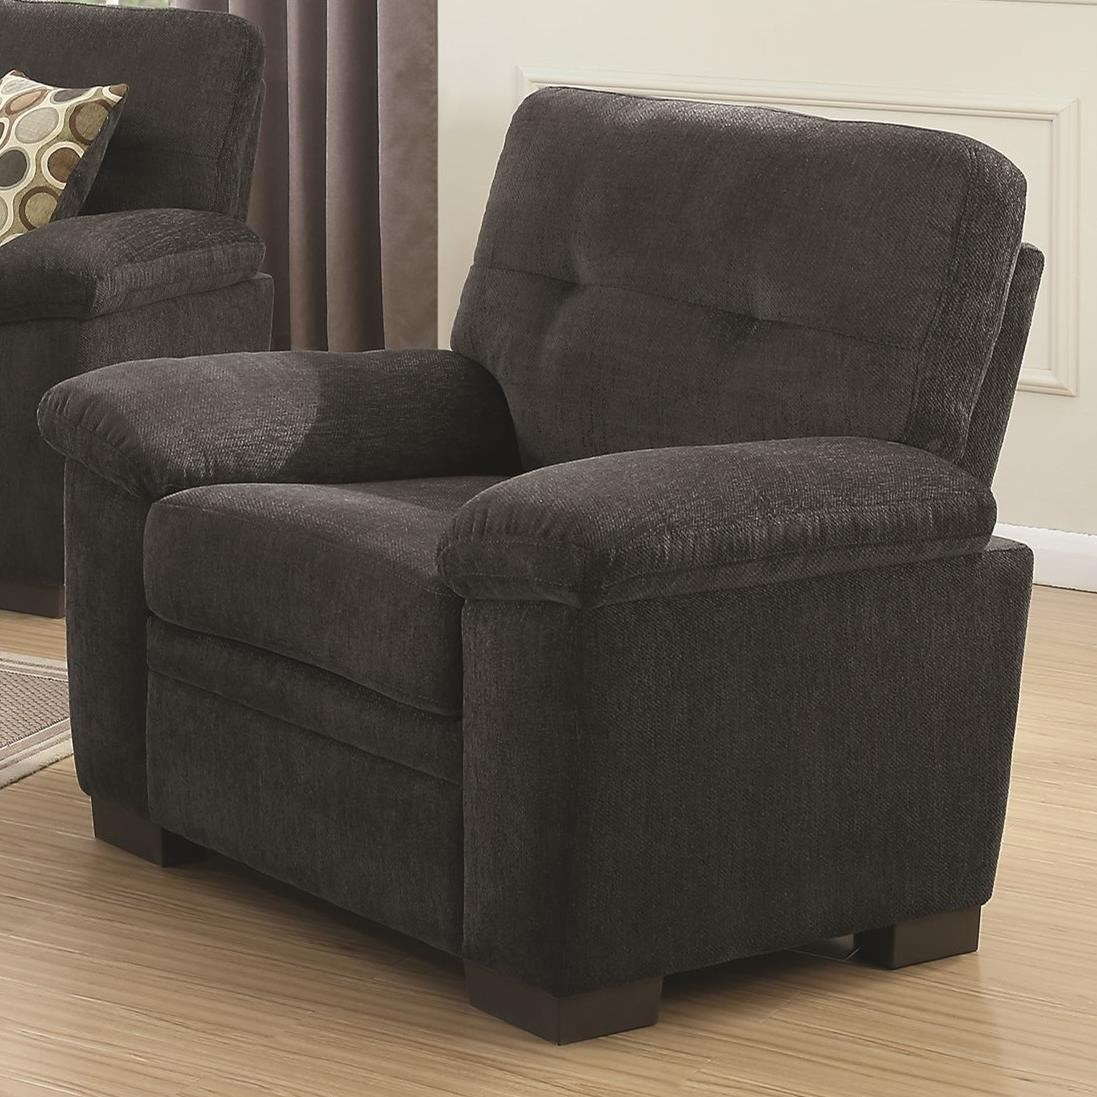 Coaster Fairbairn Chair - Item Number: 506586